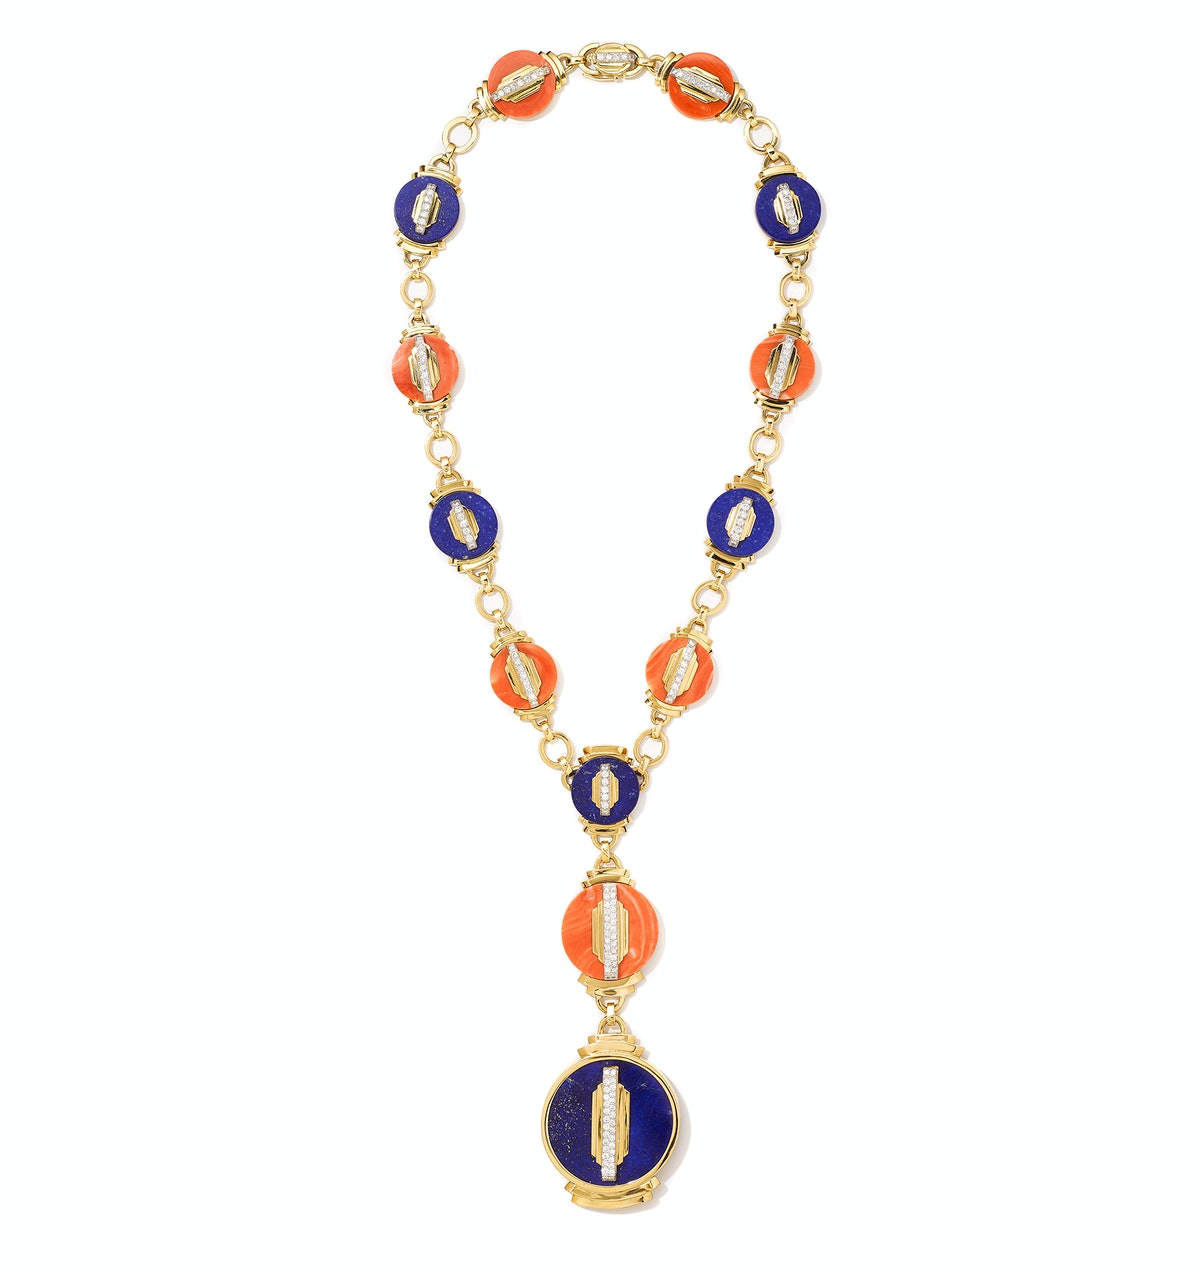 David Webb platinum, gold, coral, lapis, and diamond necklace